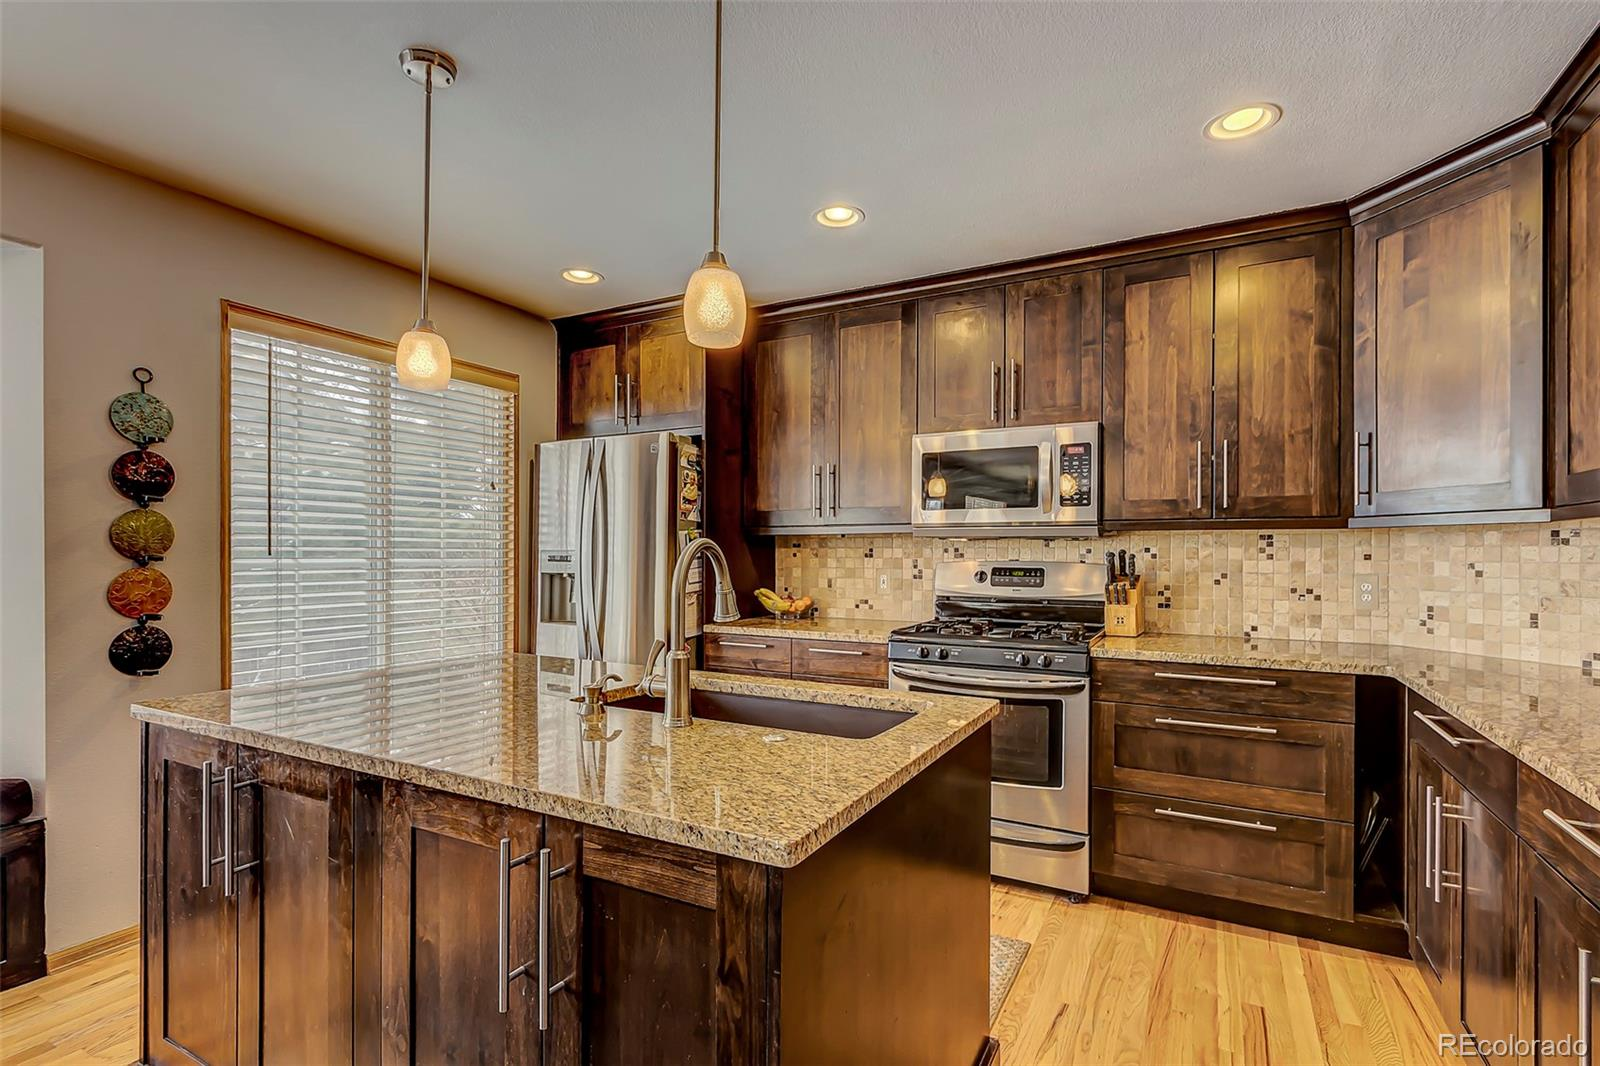 MLS# 4204081 - 7 - 2911 White Oak Trail, Highlands Ranch, CO 80129